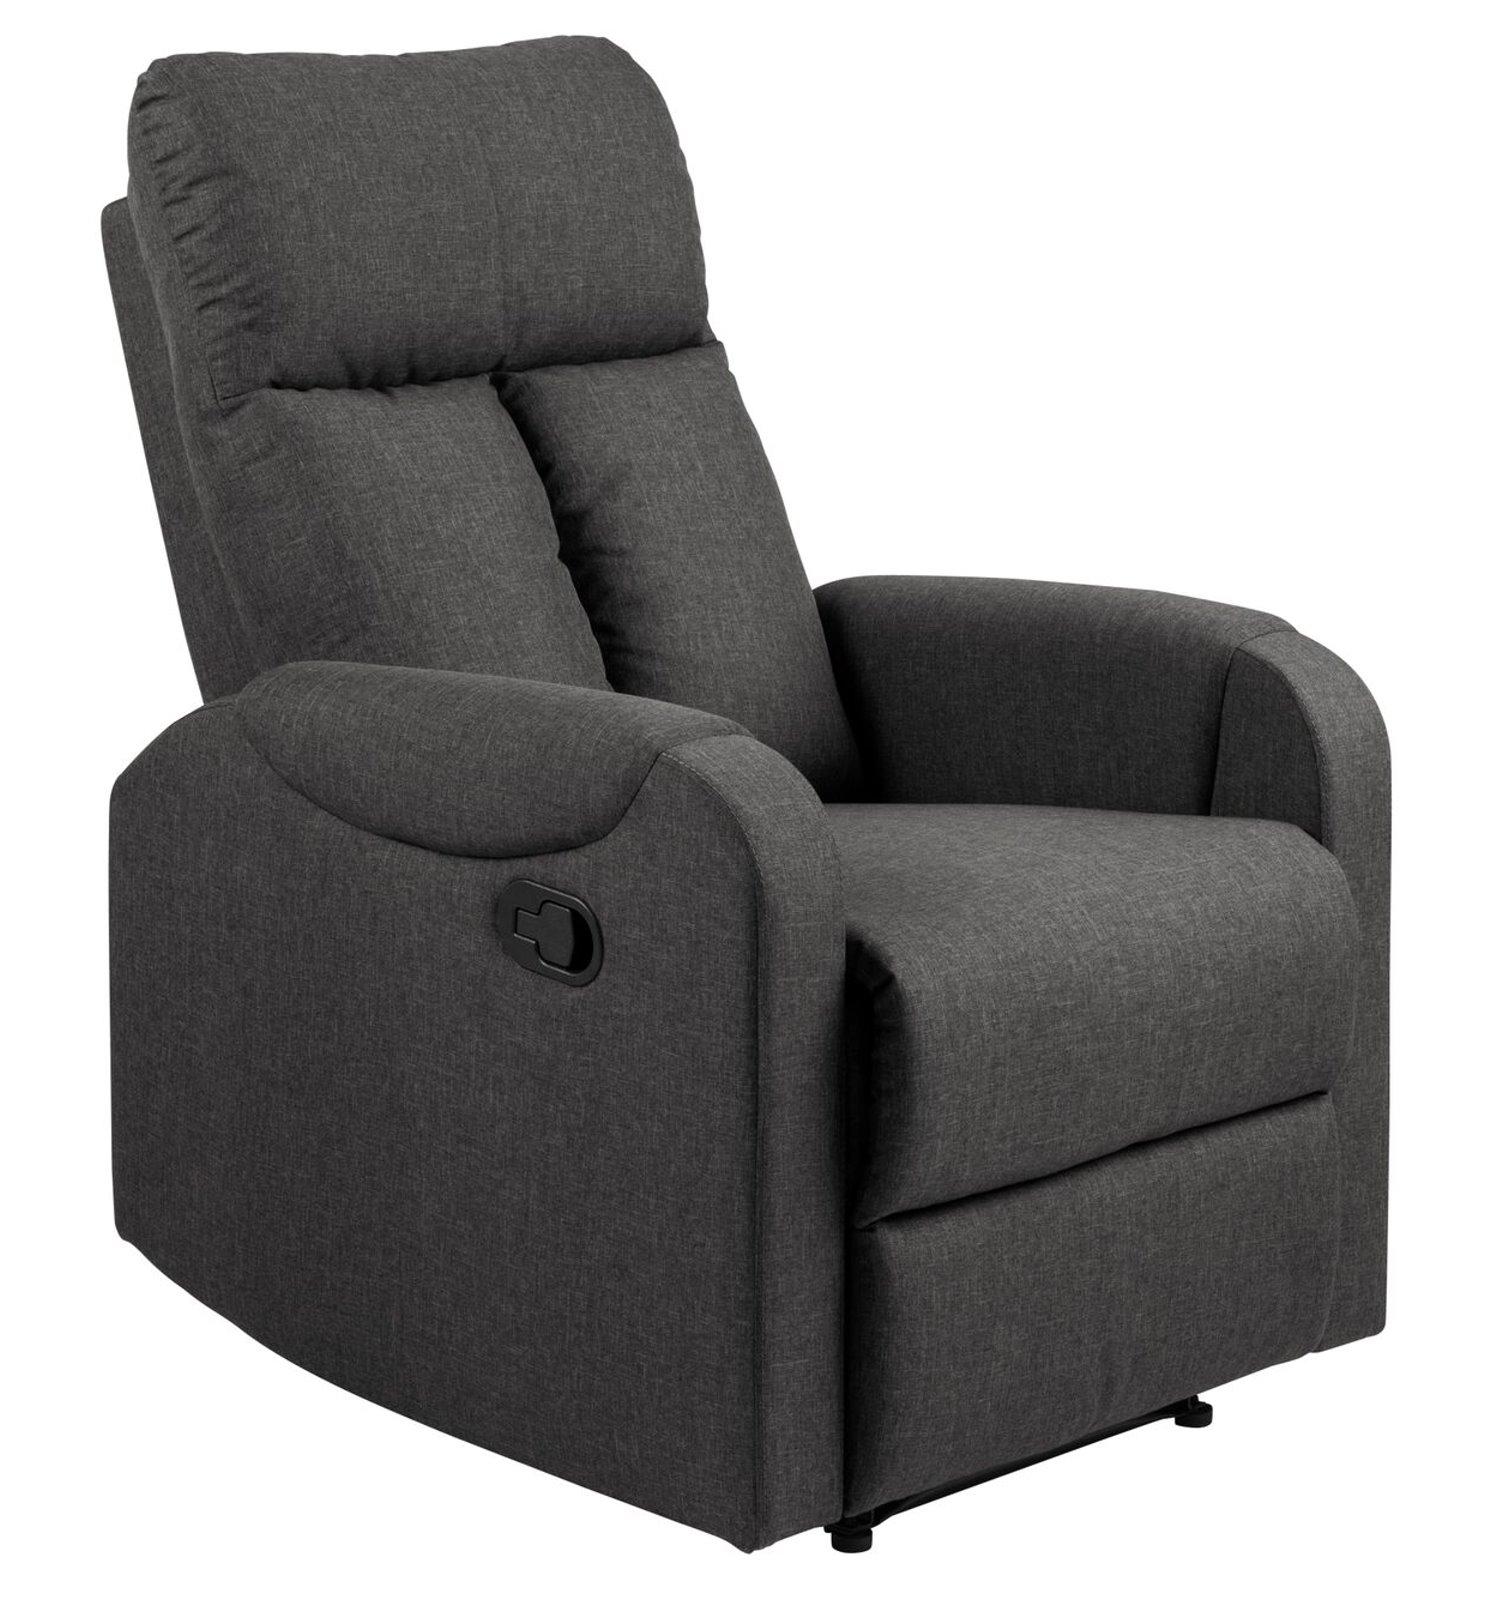 Pkline sessel rocky in grau relaxsessel fernsehsessel ebay for Relaxsessel grau stoff